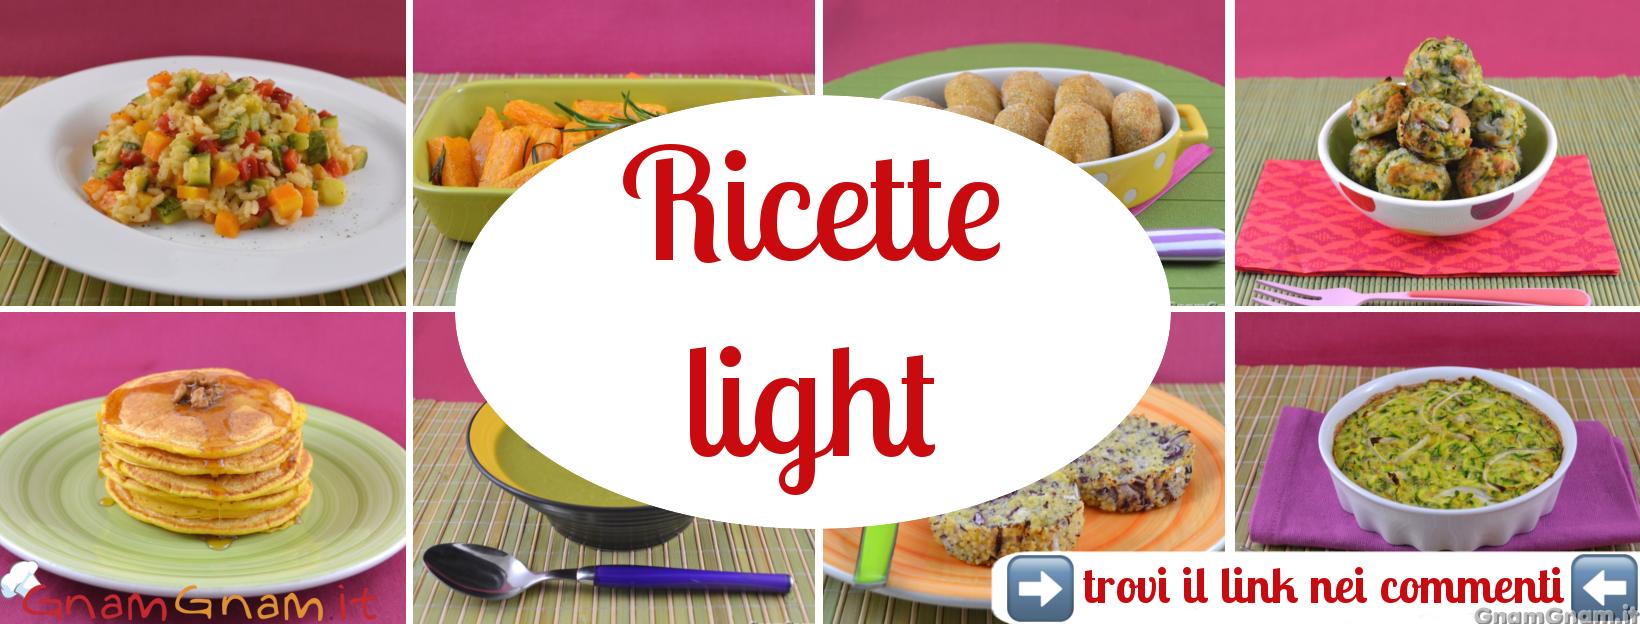 ricette vegetali per dietetici